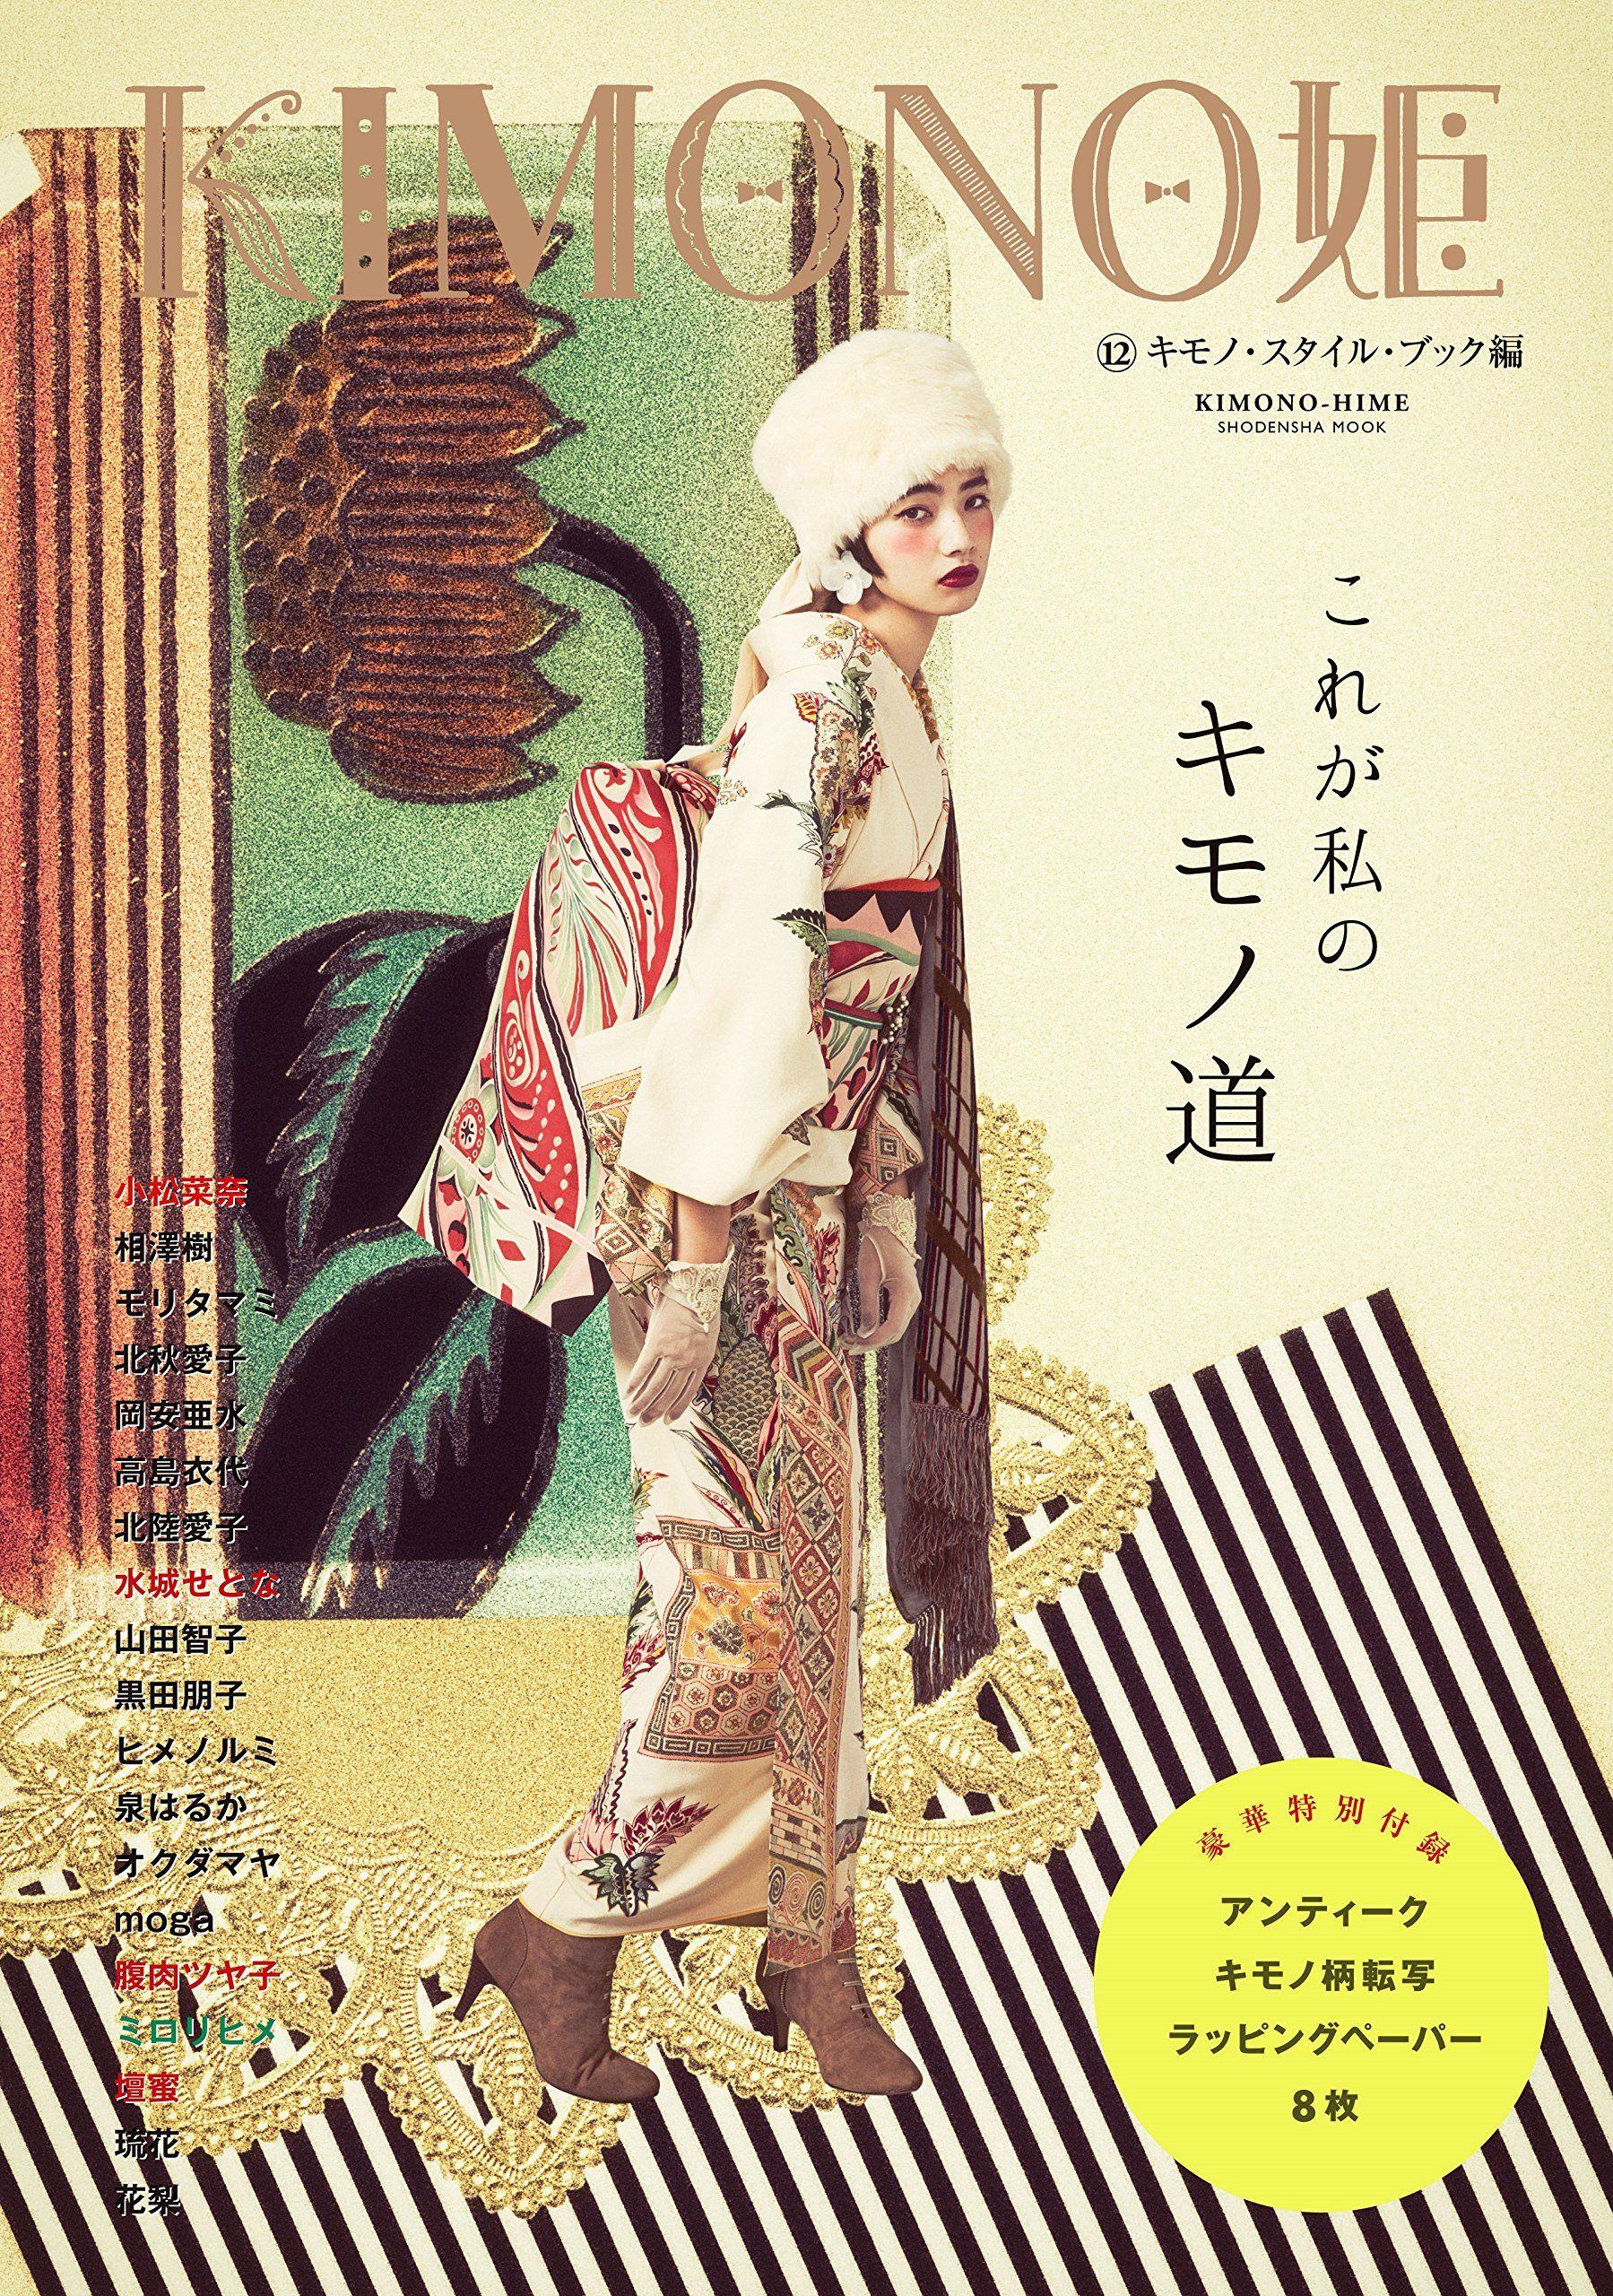 KIMONO姫12 キモノ・スタイル・ブック編 (祥伝社ムック) | | 本-通販 | Amazon.co.jp